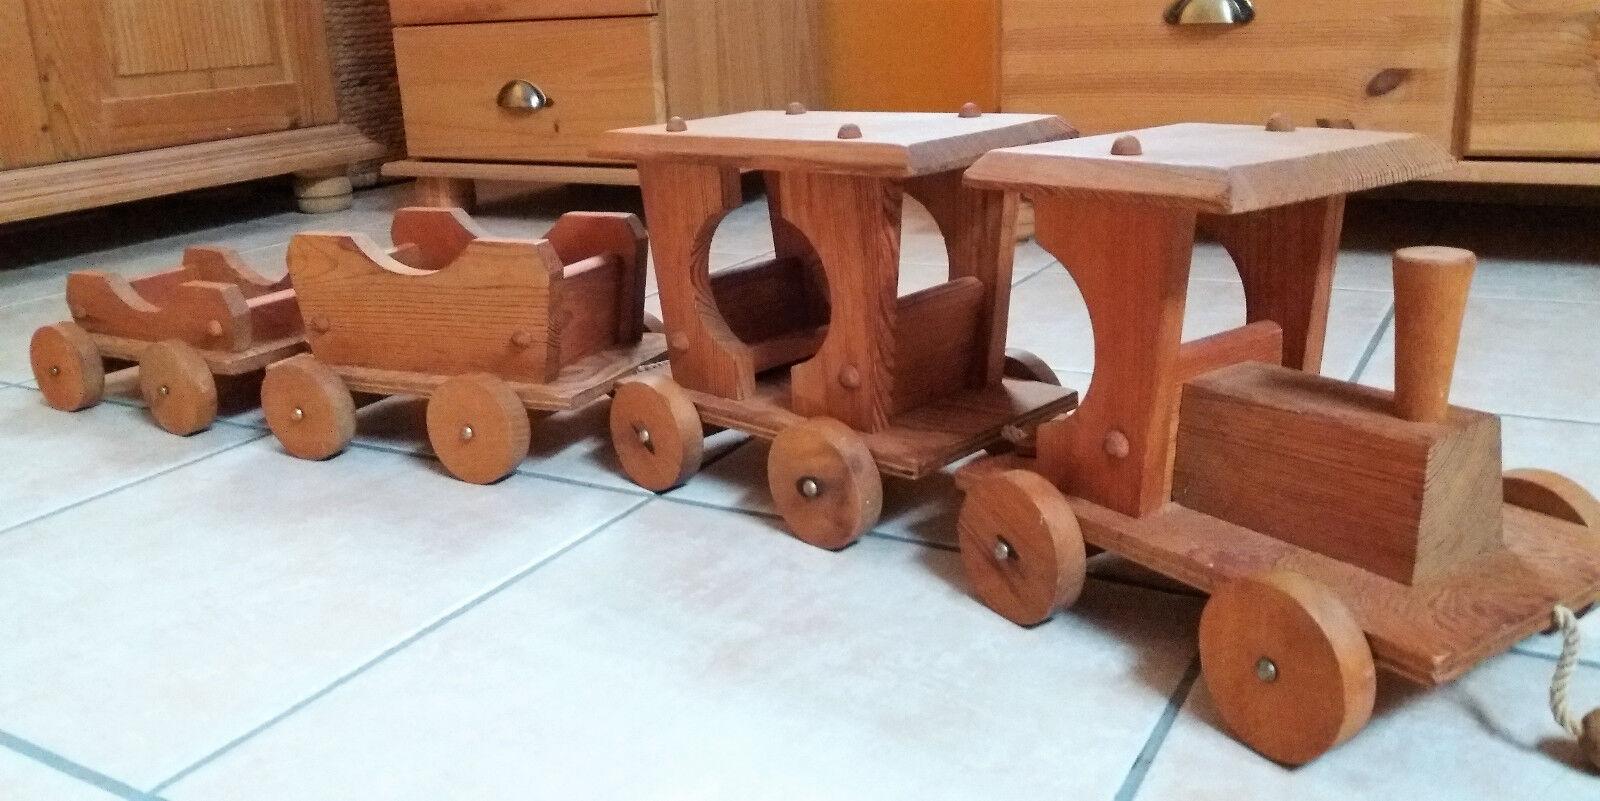 Großer massiver Holzzug mit 3 Anhängern-Handarbeit-Natur geölt-Gesamtl.108cm